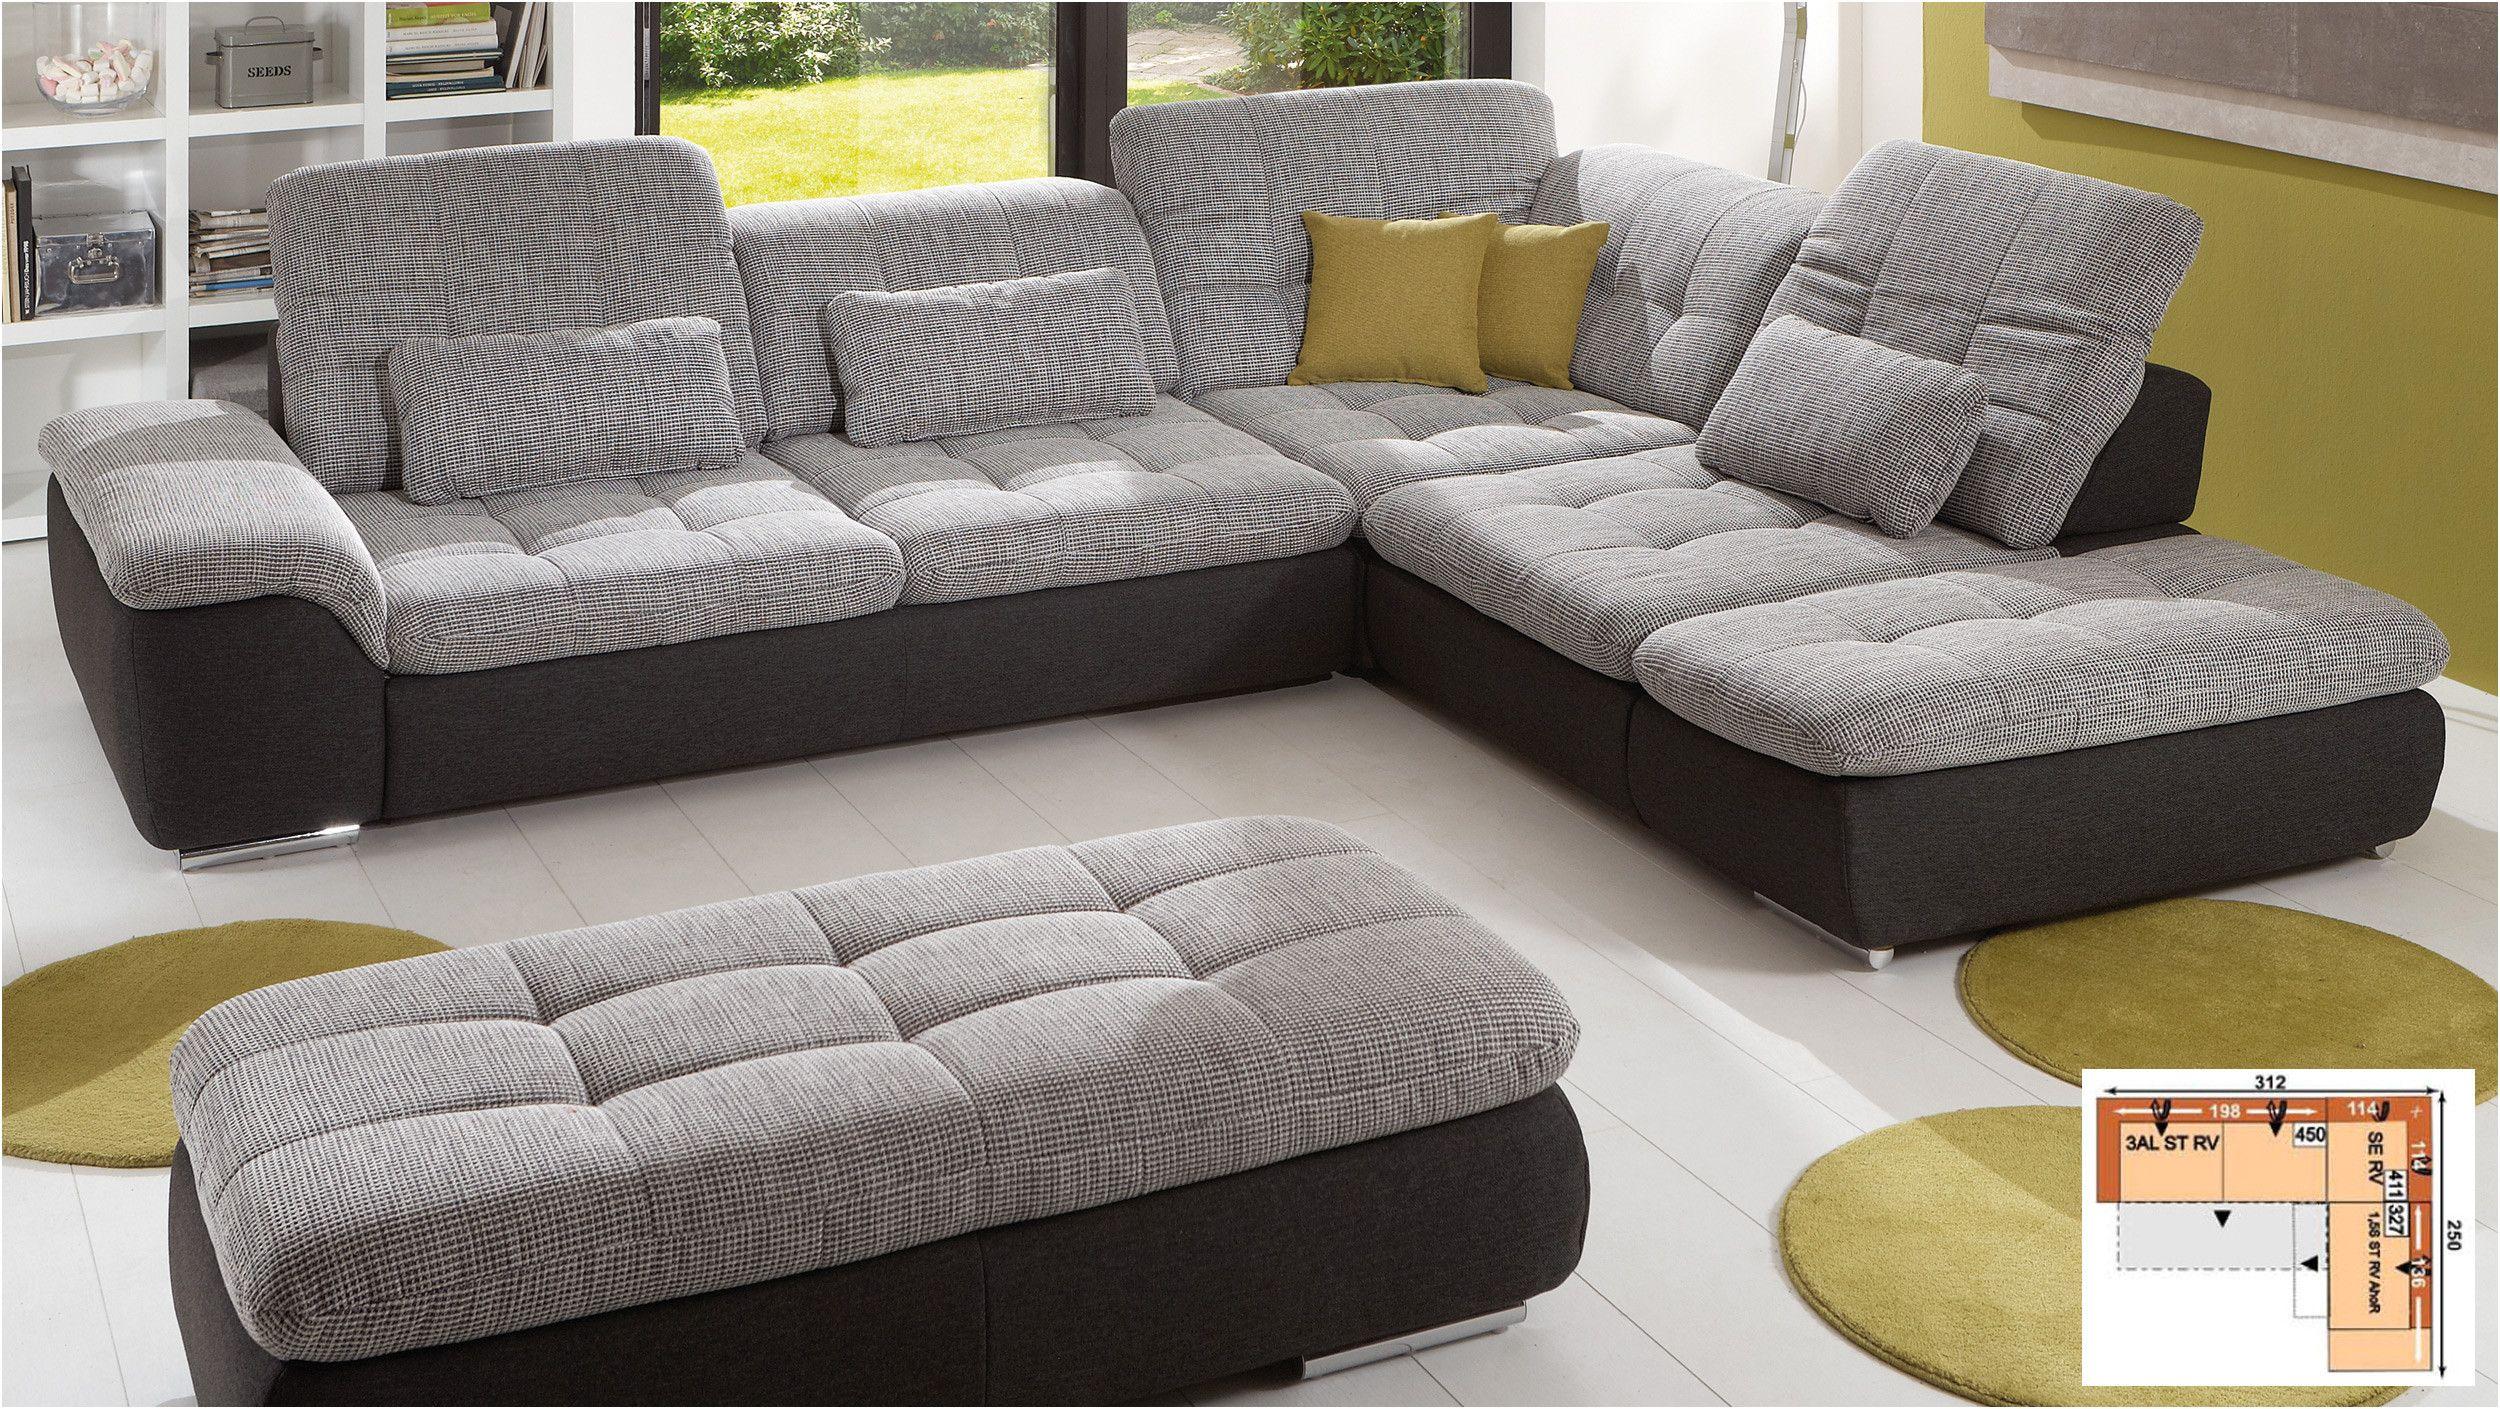 Full Size of Poco Big Sofa Couch Gunstig Hülsta Für Esstisch Himolla Modulares Sitzhöhe 55 Cm Chesterfield Grau Büffelleder Lounge Garten Ebay Bezug Relaxfunktion Sofa Poco Big Sofa